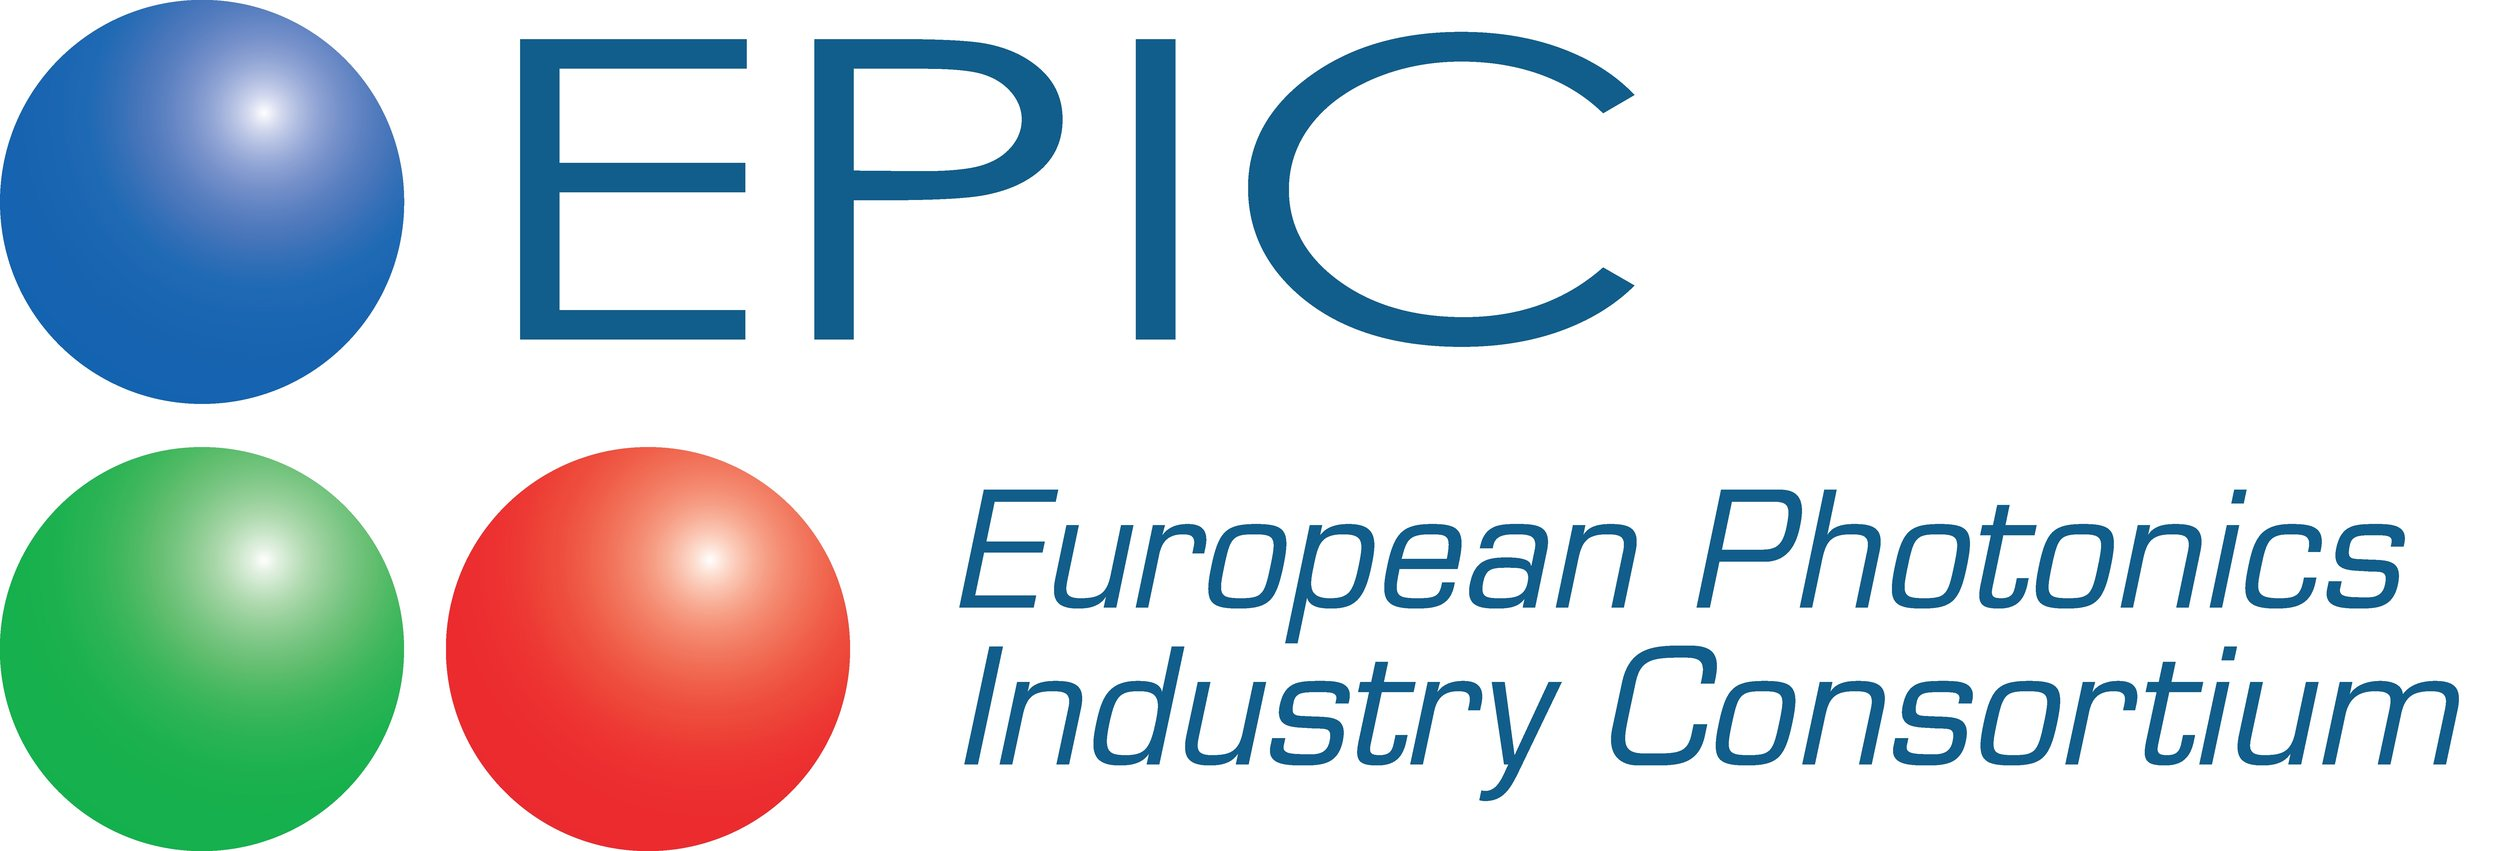 EPIC logo high resolution.jpg